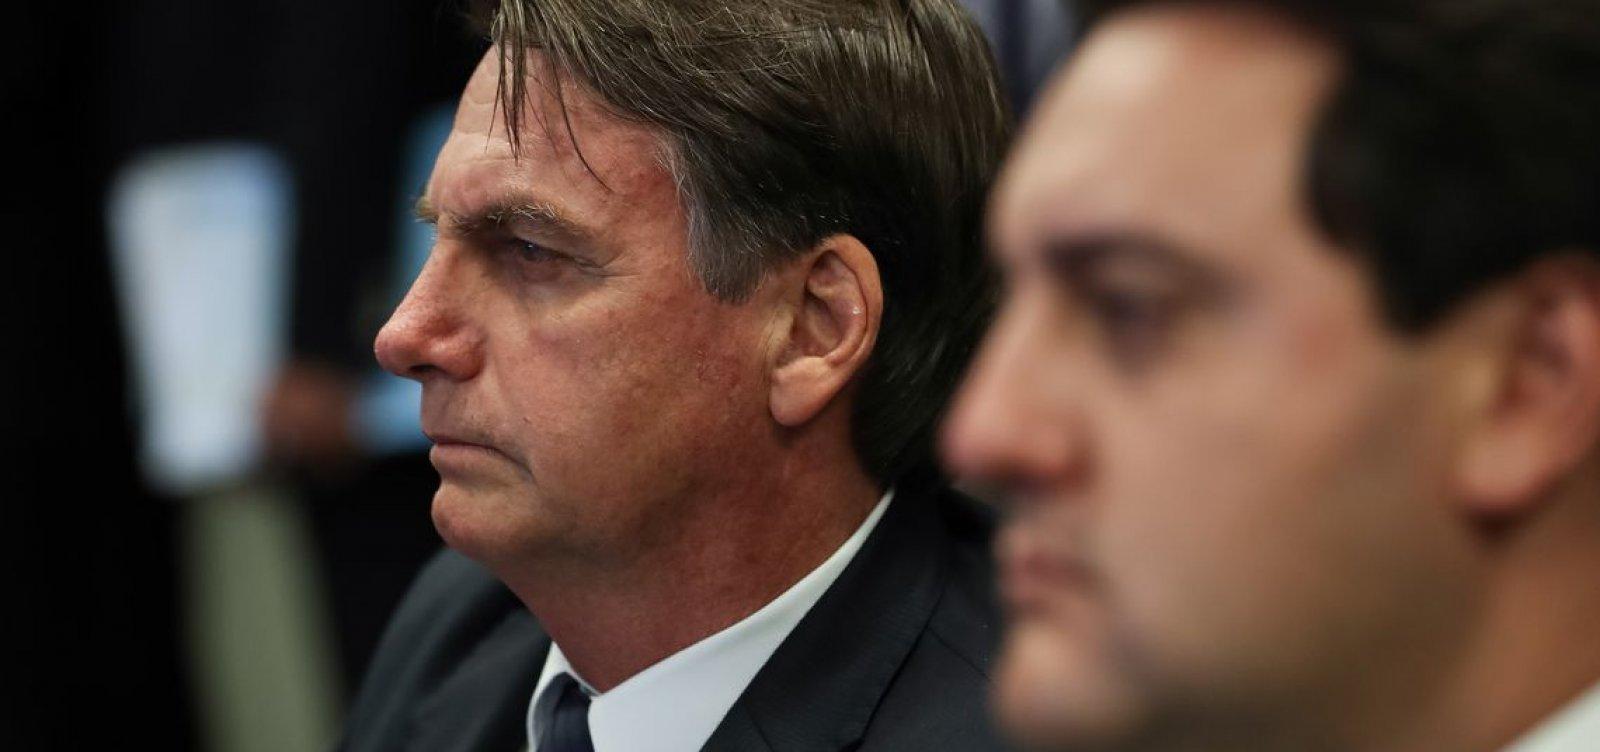 [Bolsonaro afirma que vai indicar Moro para próxima vaga no STF]